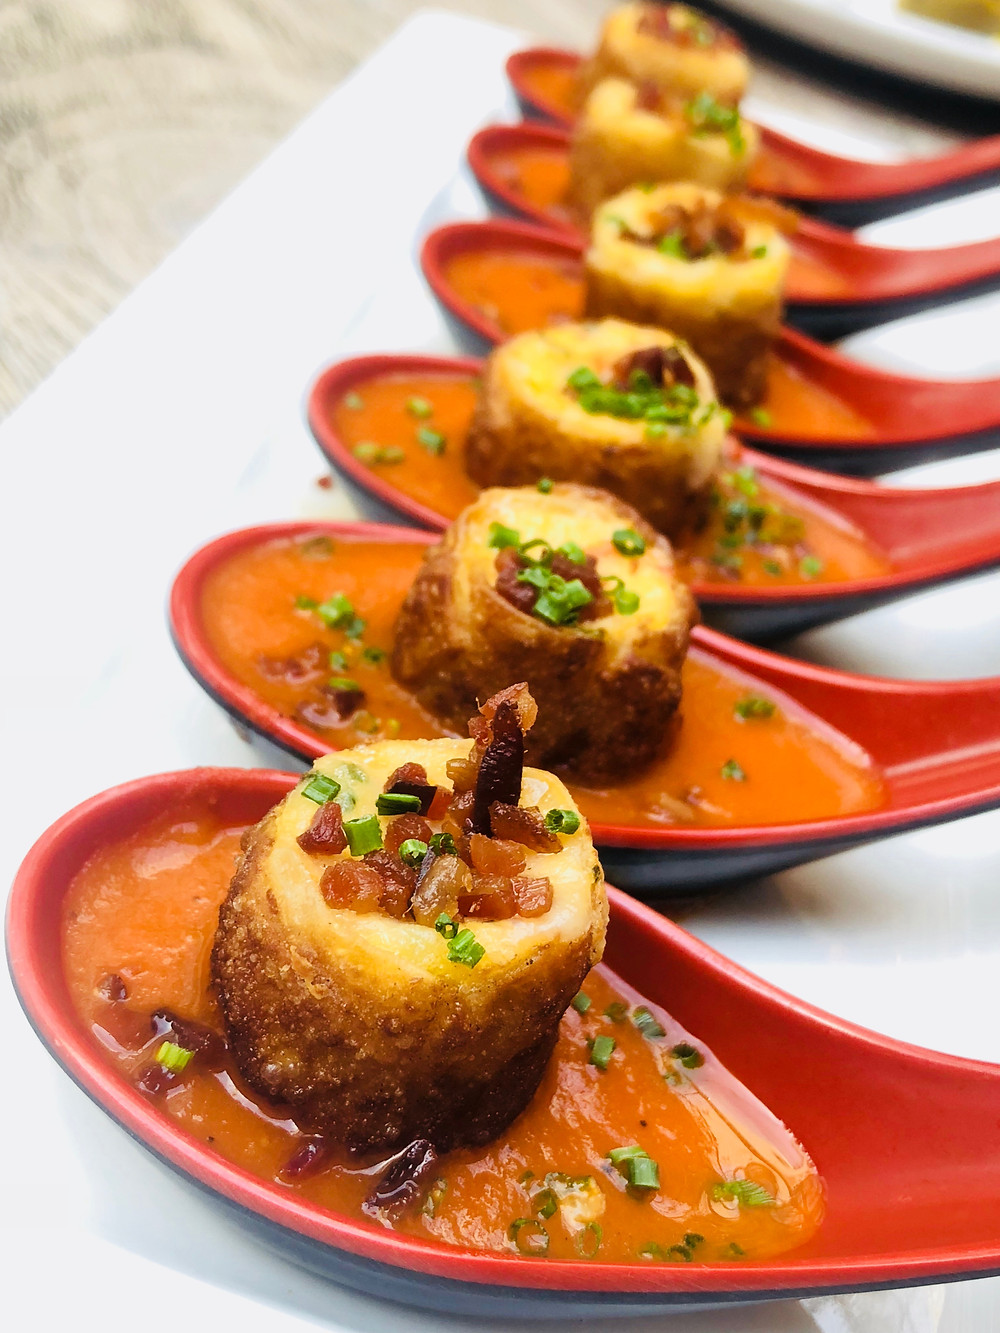 Beauty & Essex Tomato Soup Dumplings